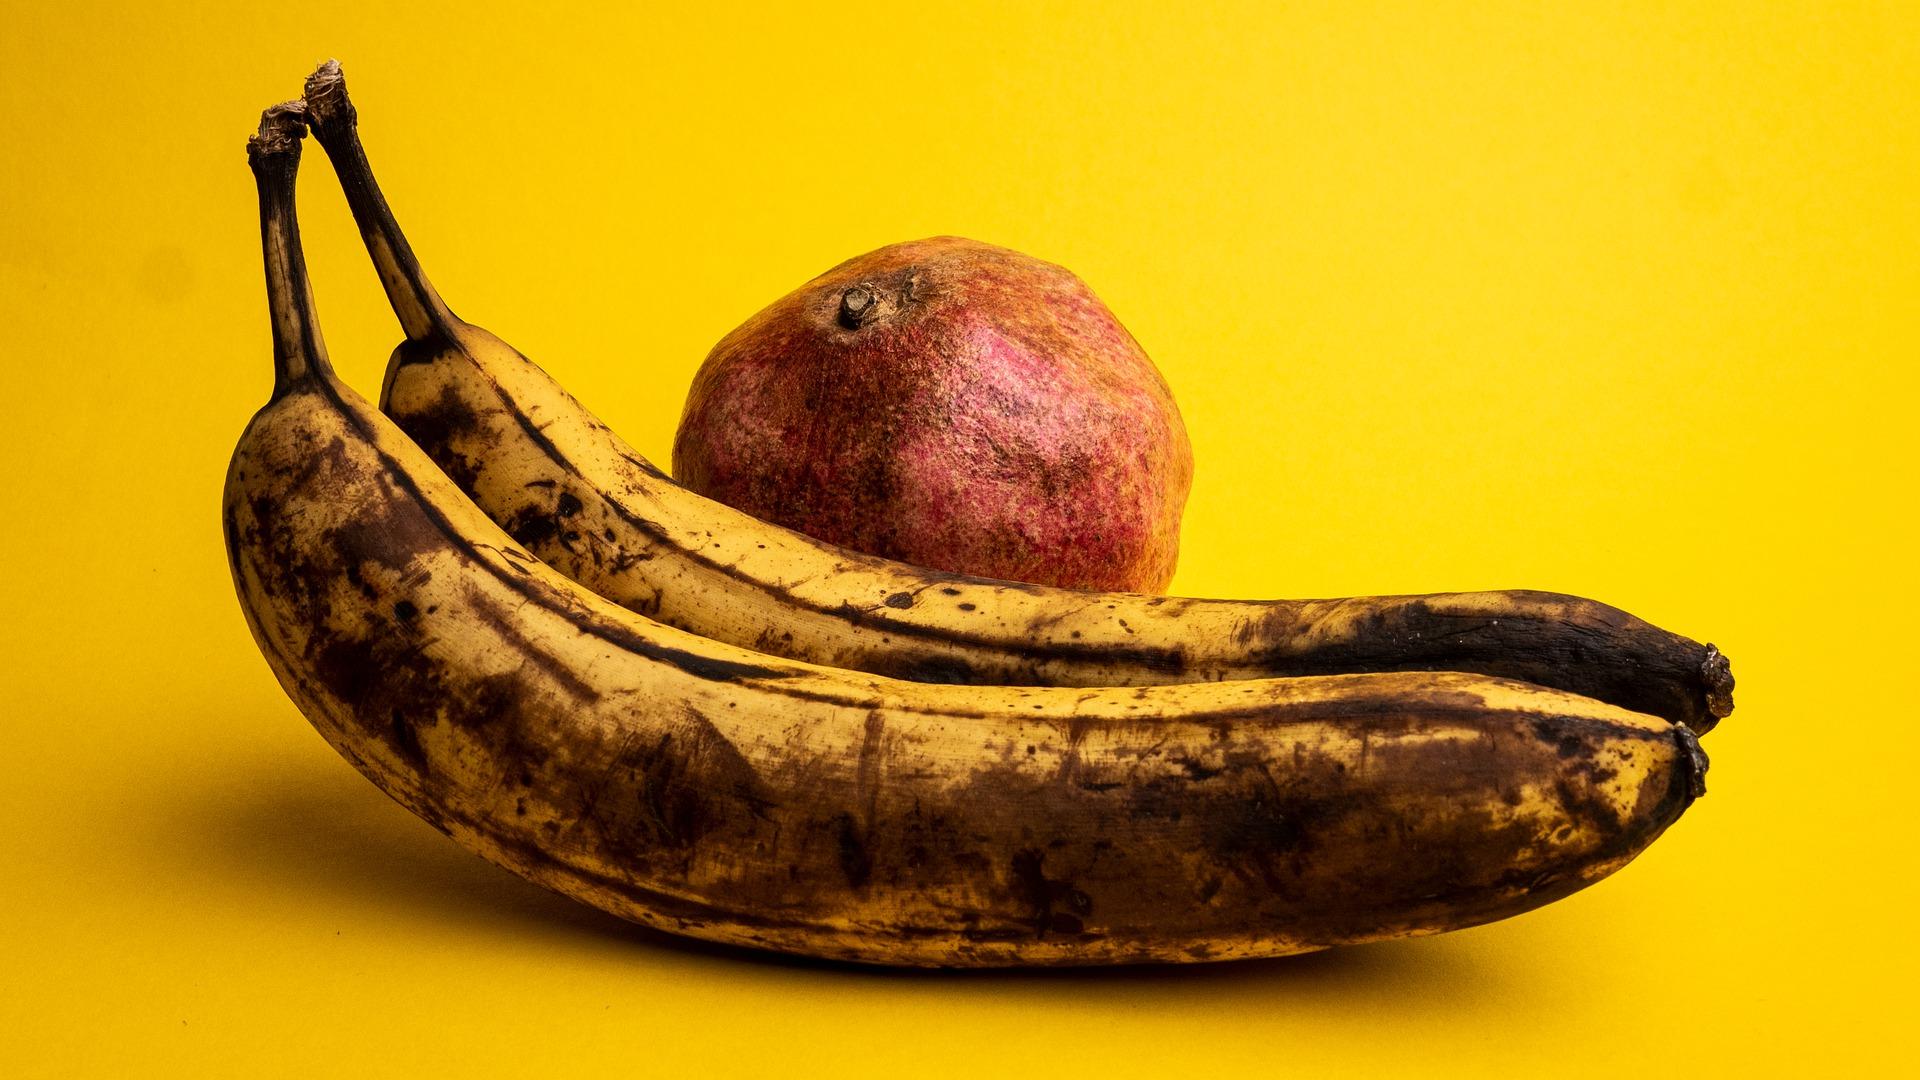 overriped fruits attracts fruit flies